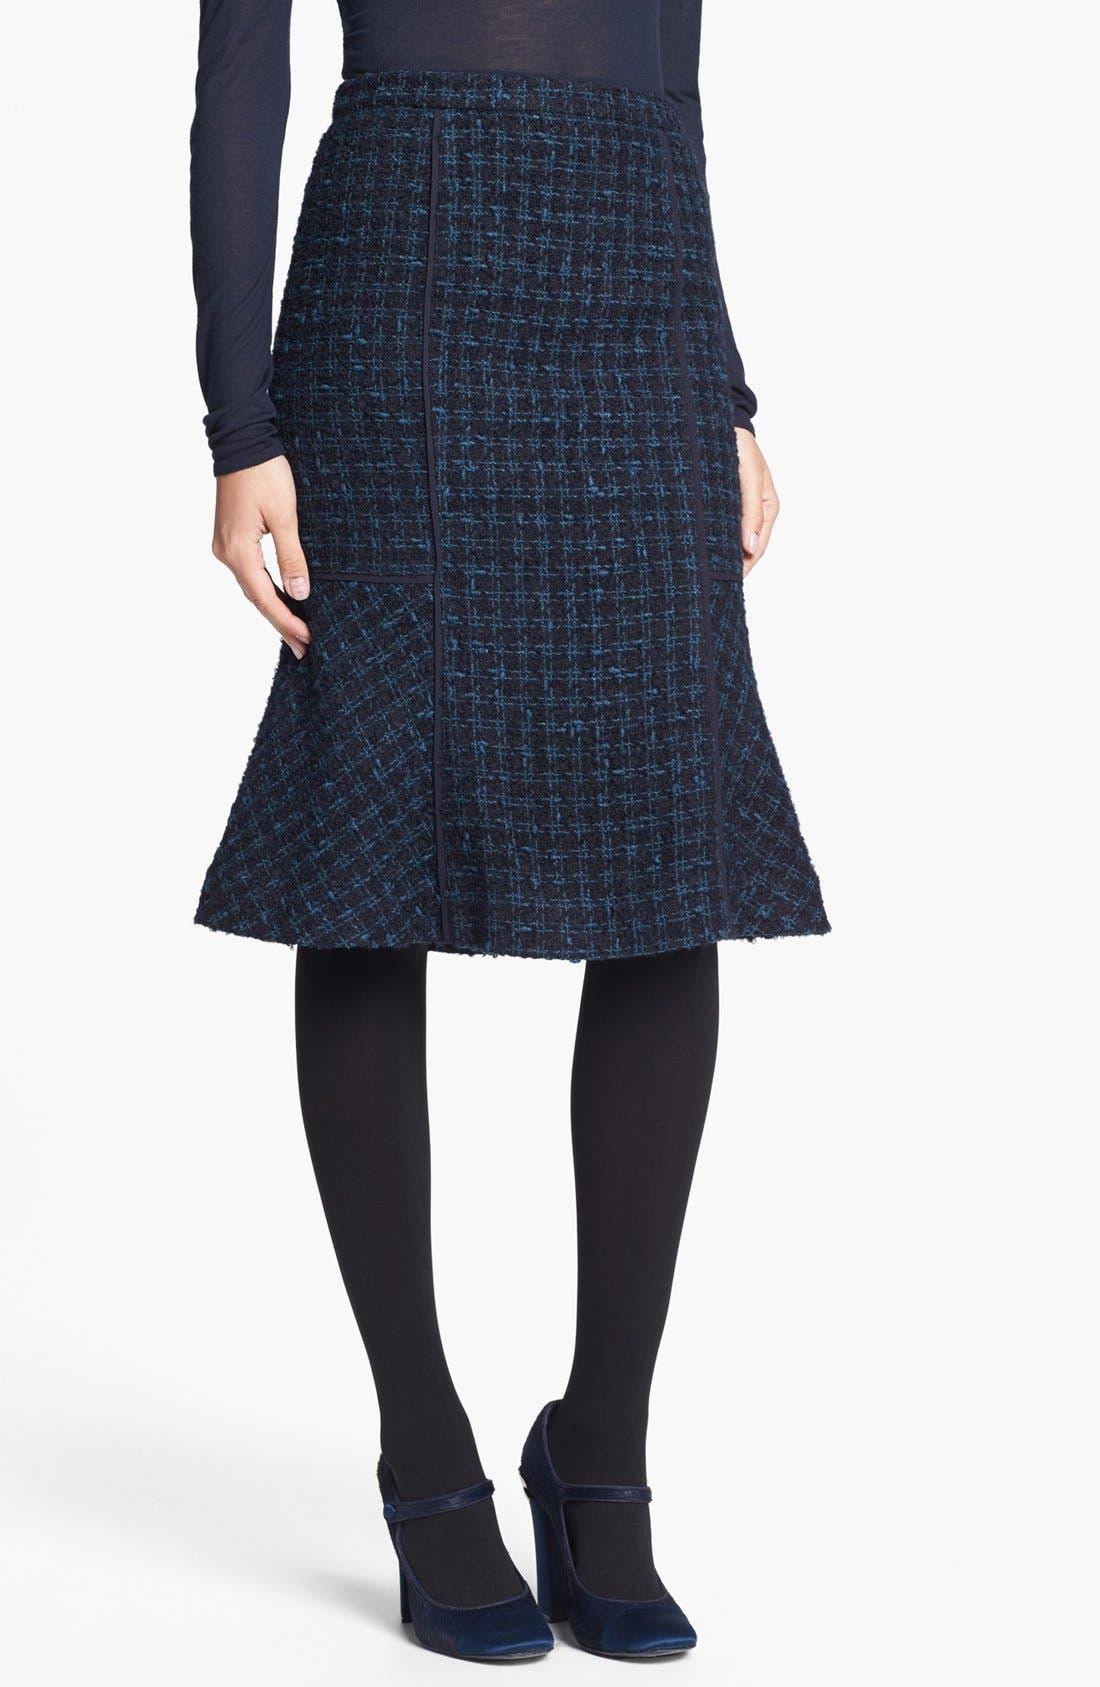 Main Image - Tory Burch 'Sloane' Tweed Skirt